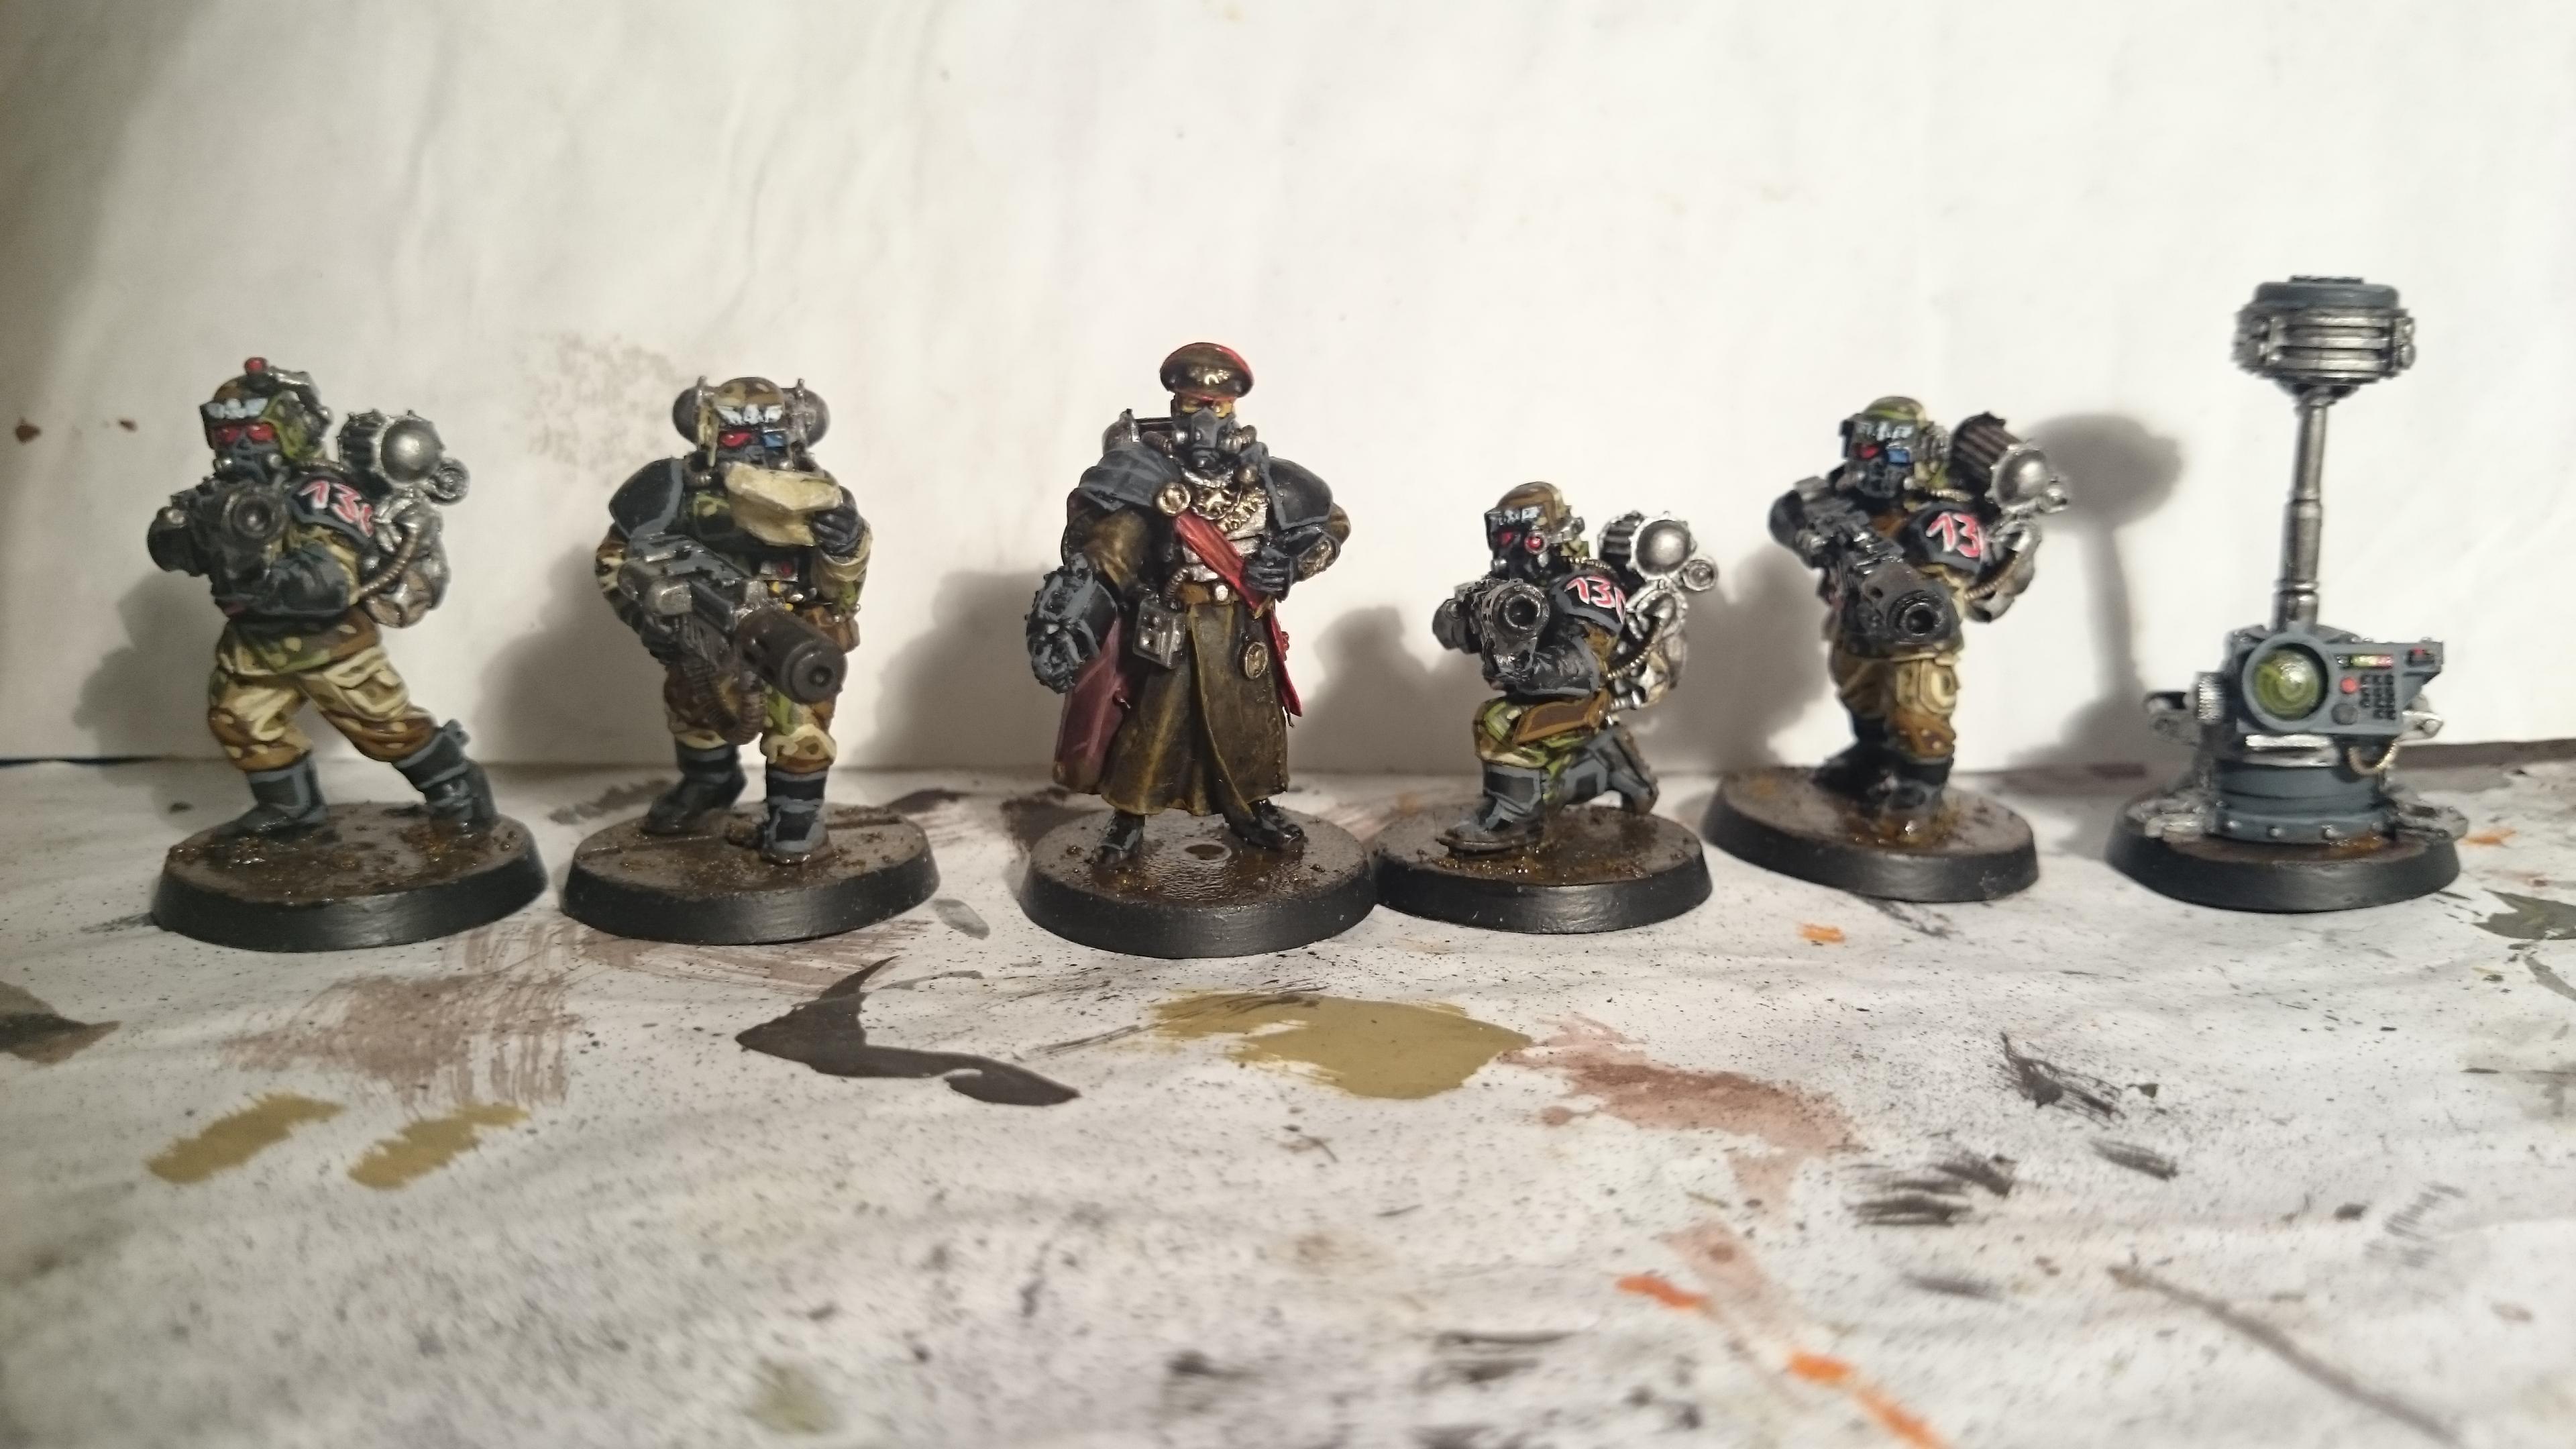 The Command Squad